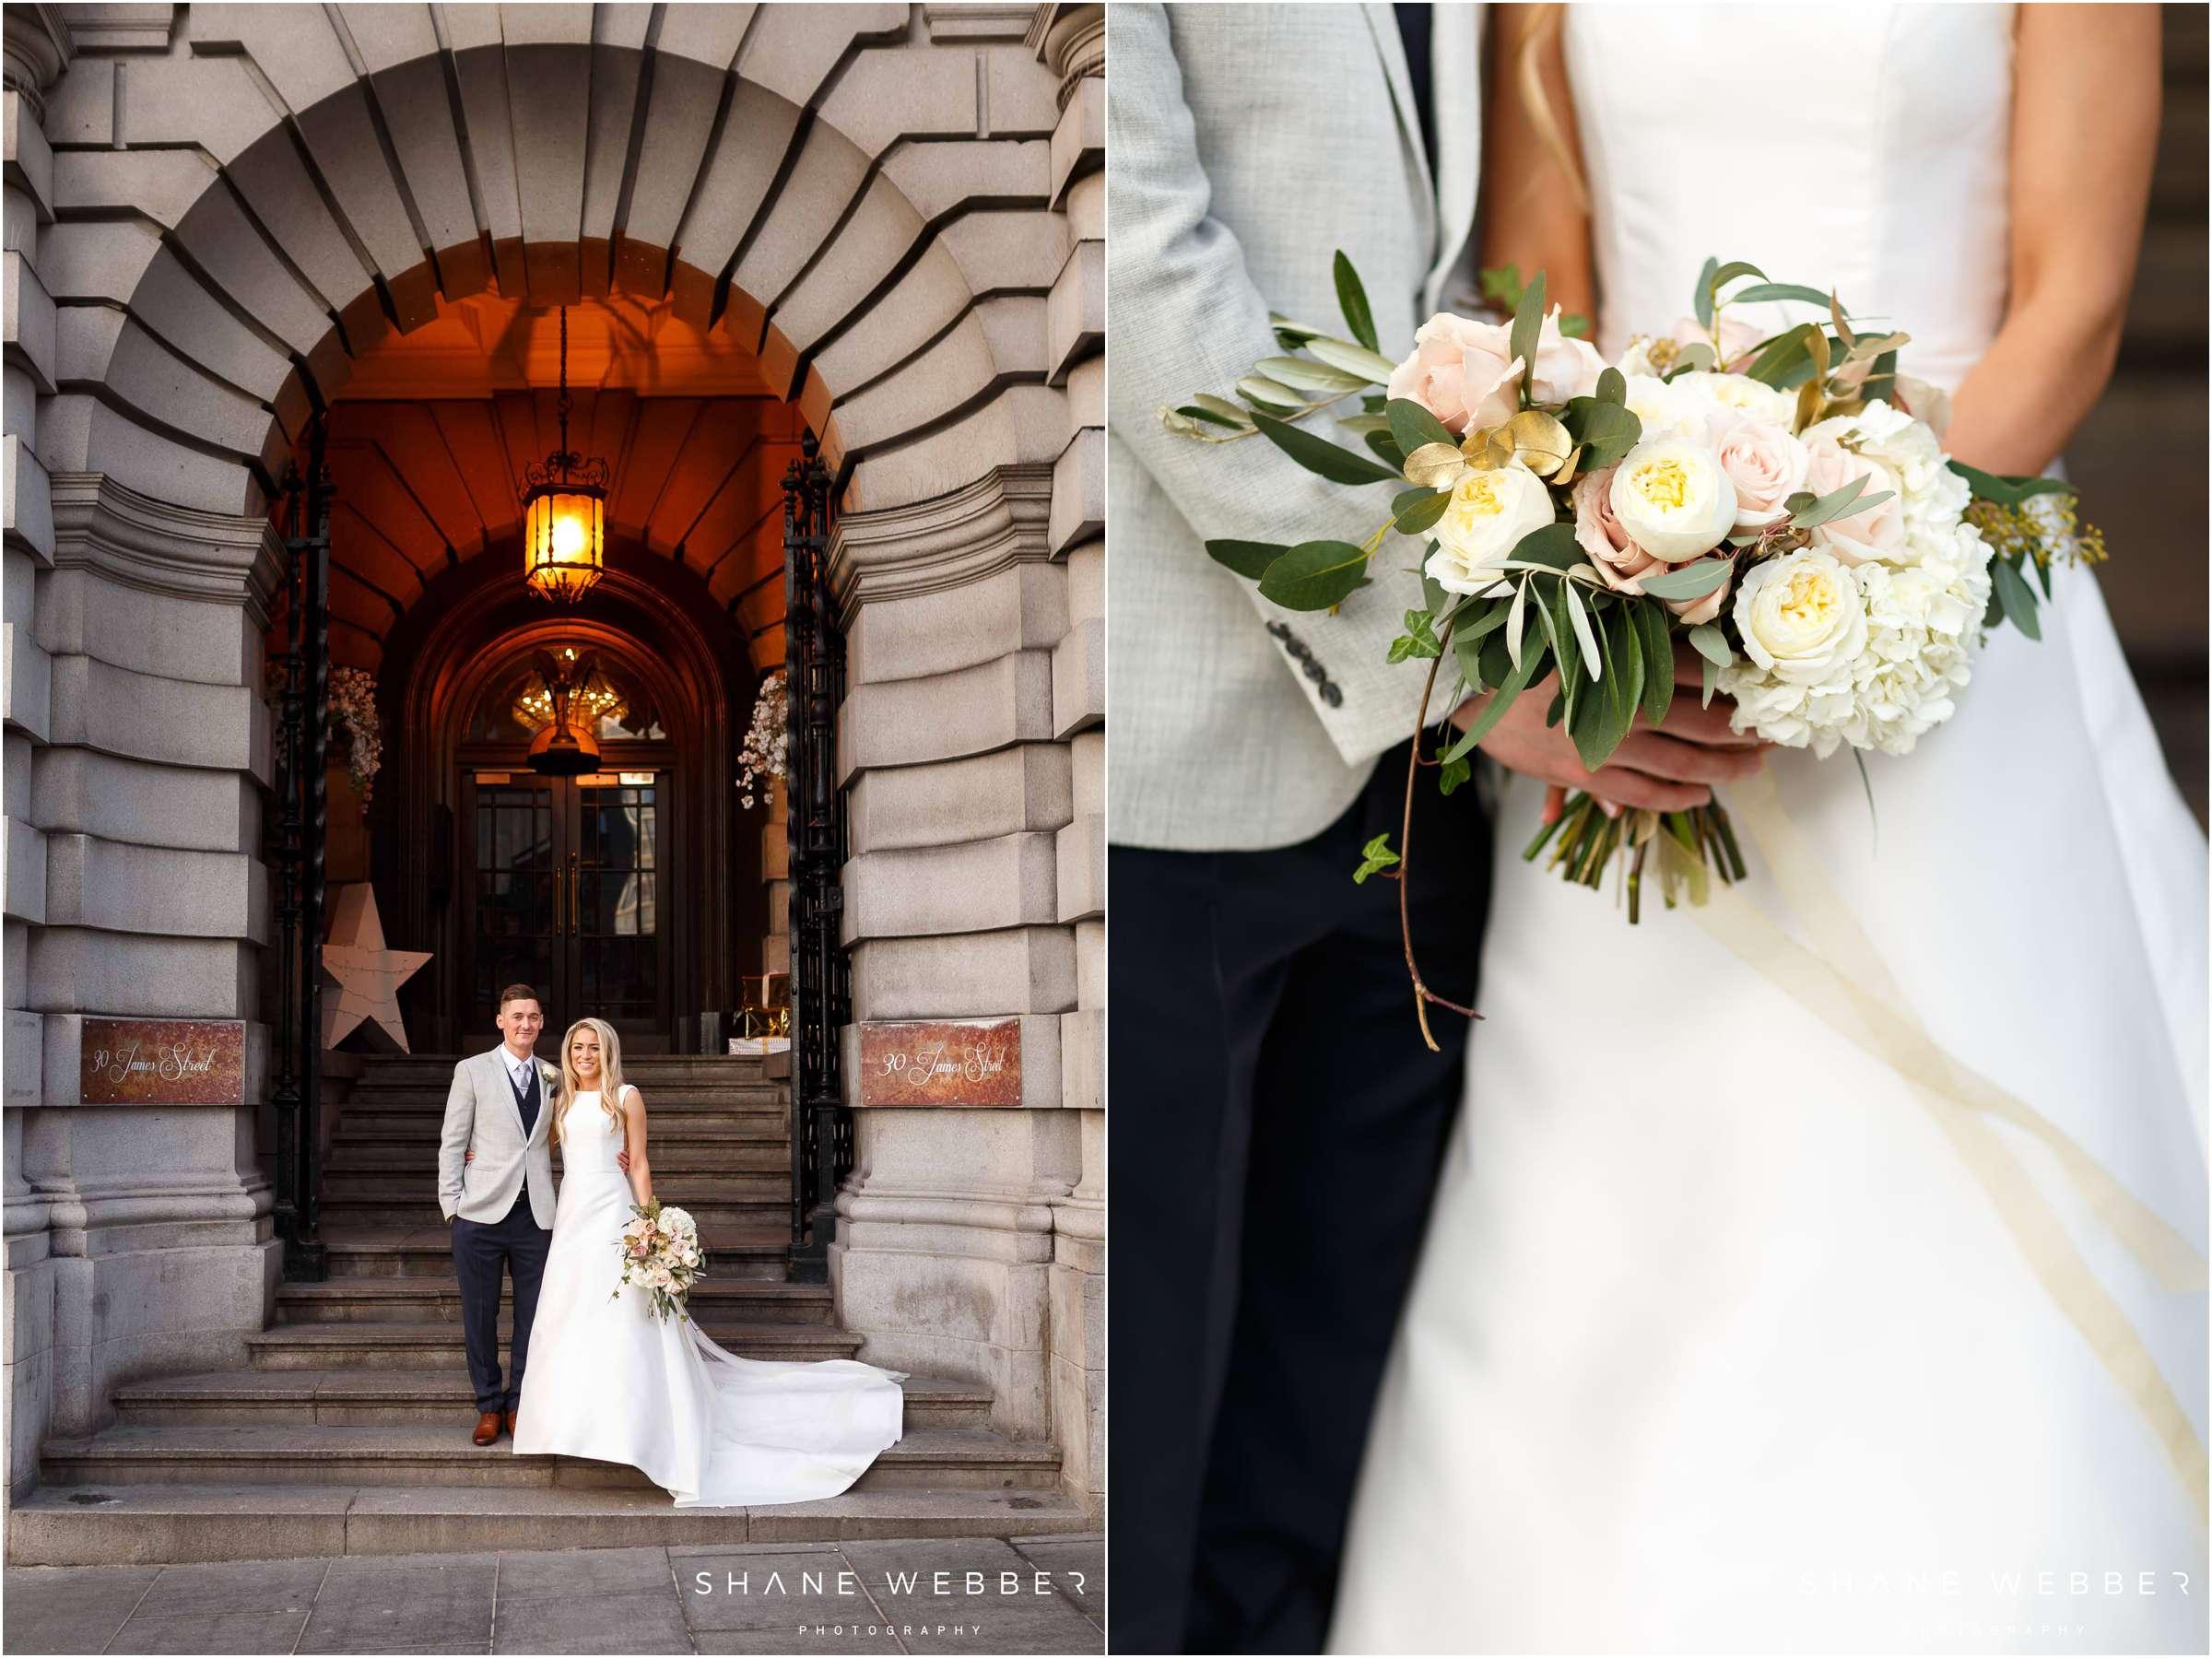 30 James Street Winter Wedding photography